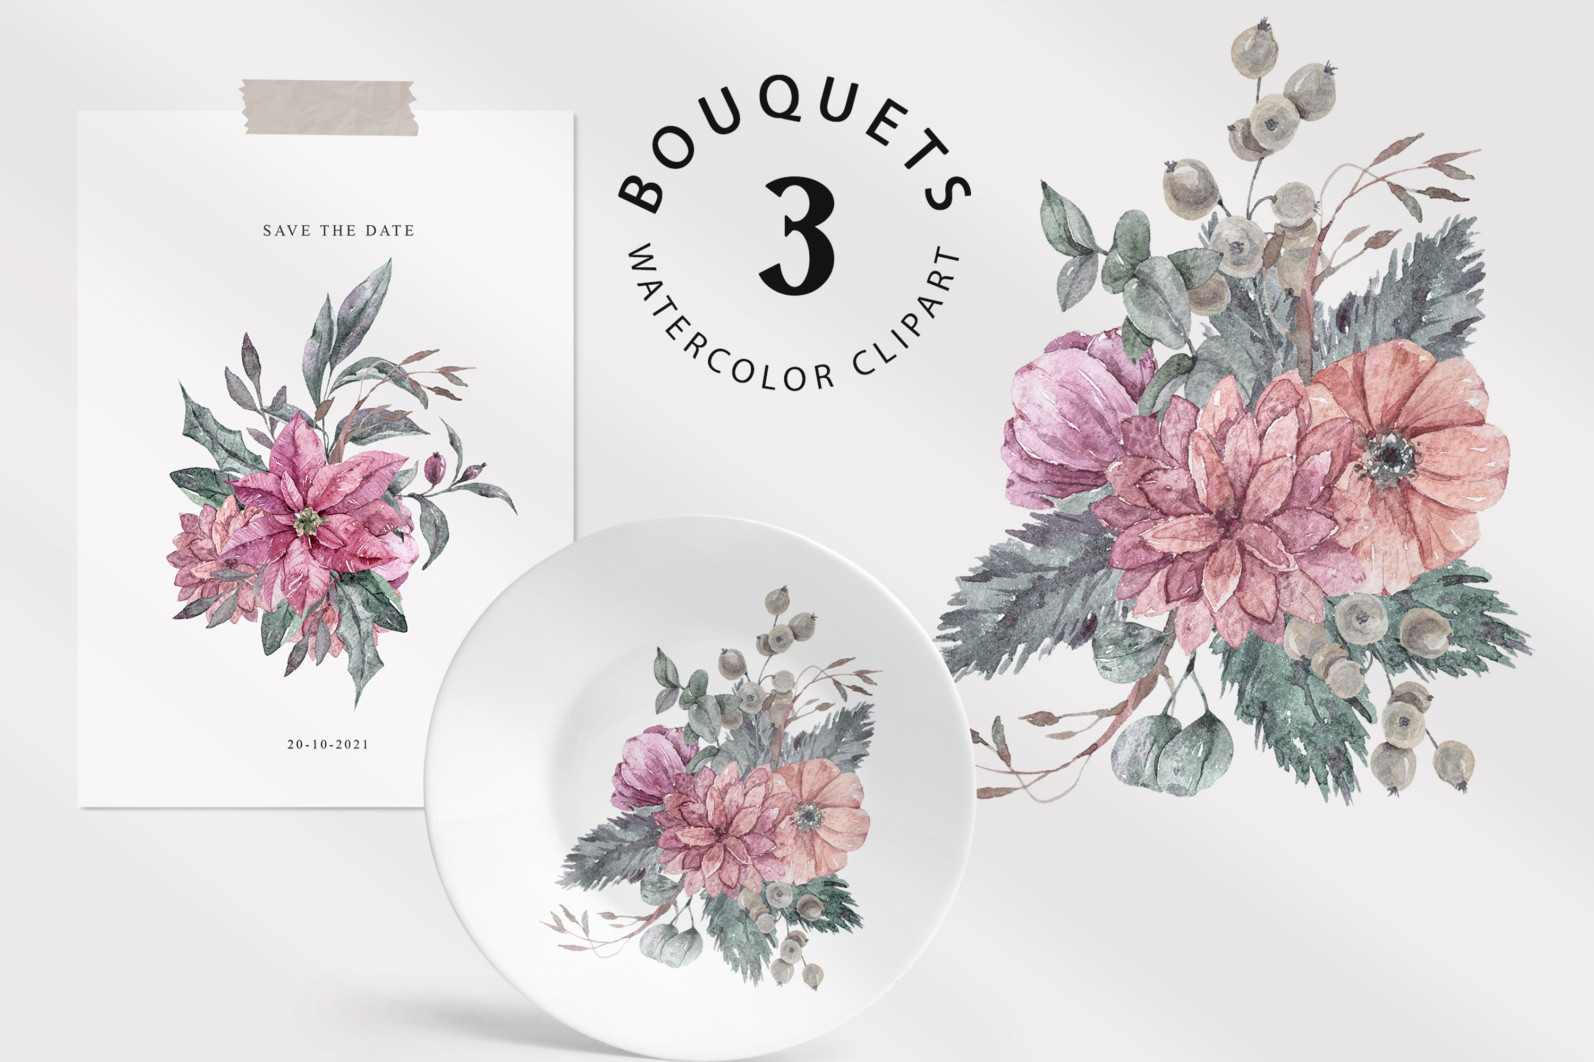 Floral bouquets sublimation / clipart- 3 png files - preview bouquets 3 scaled -